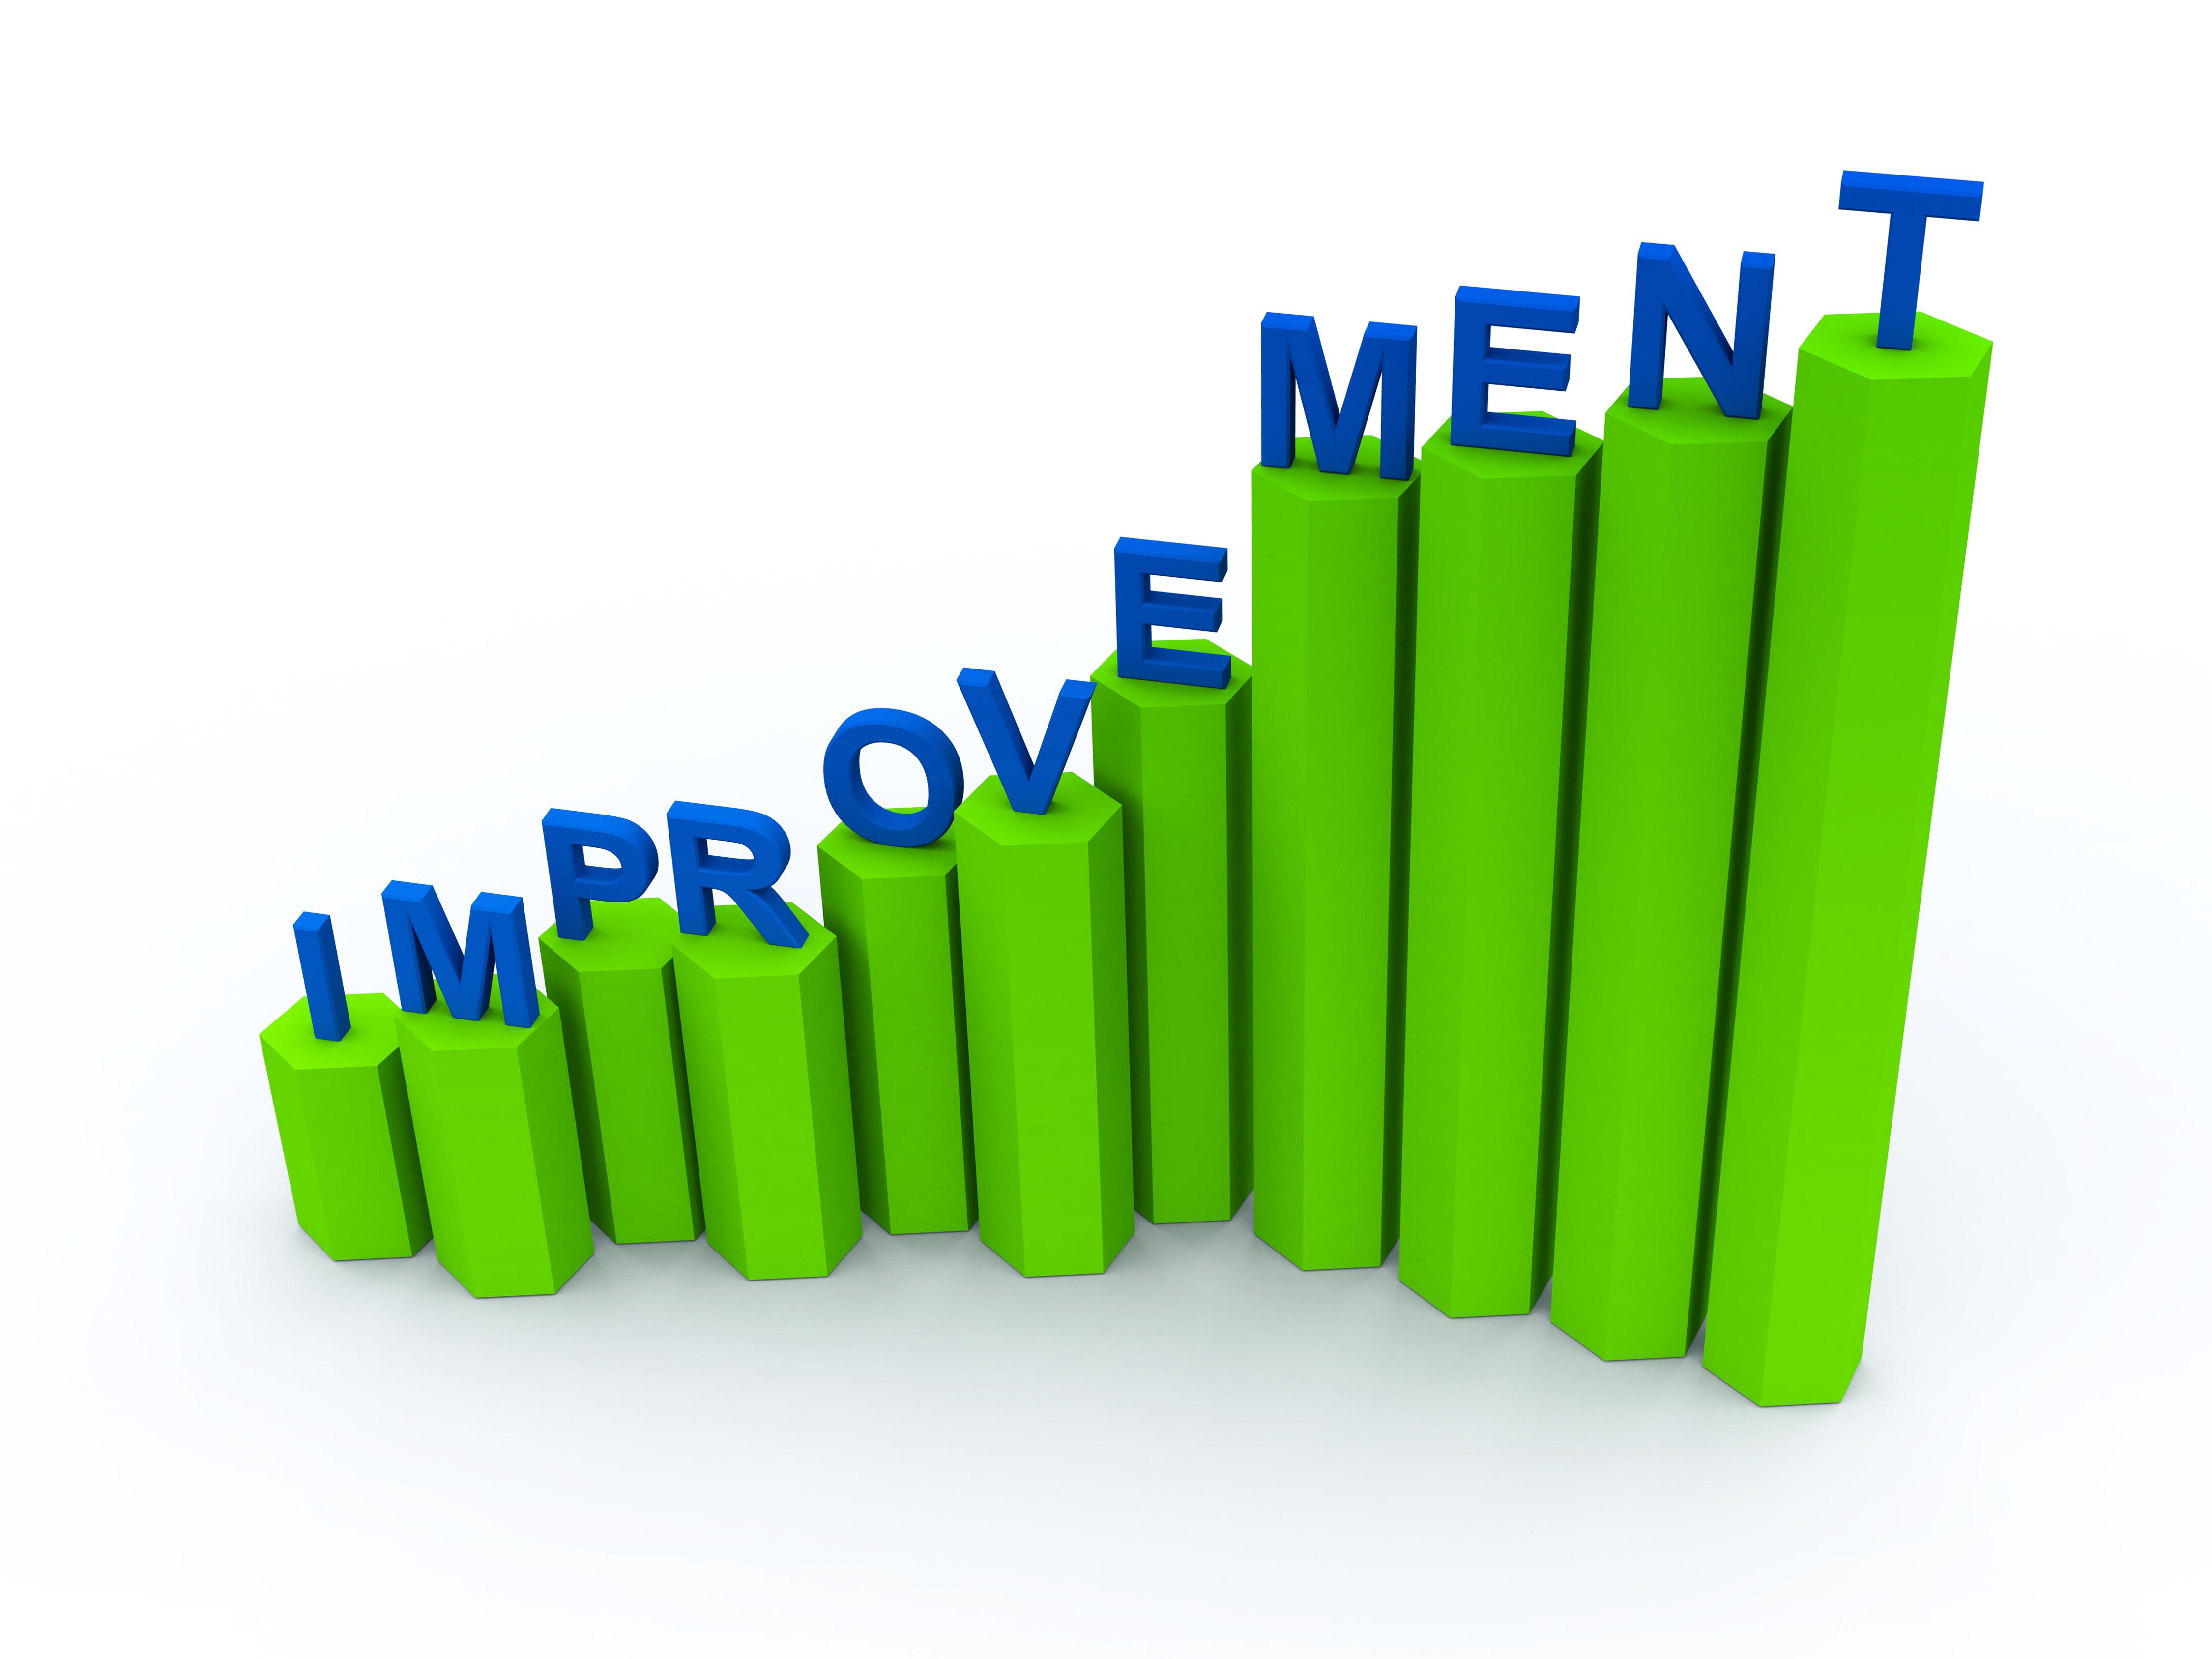 Improving Retirement Plan Outcomes